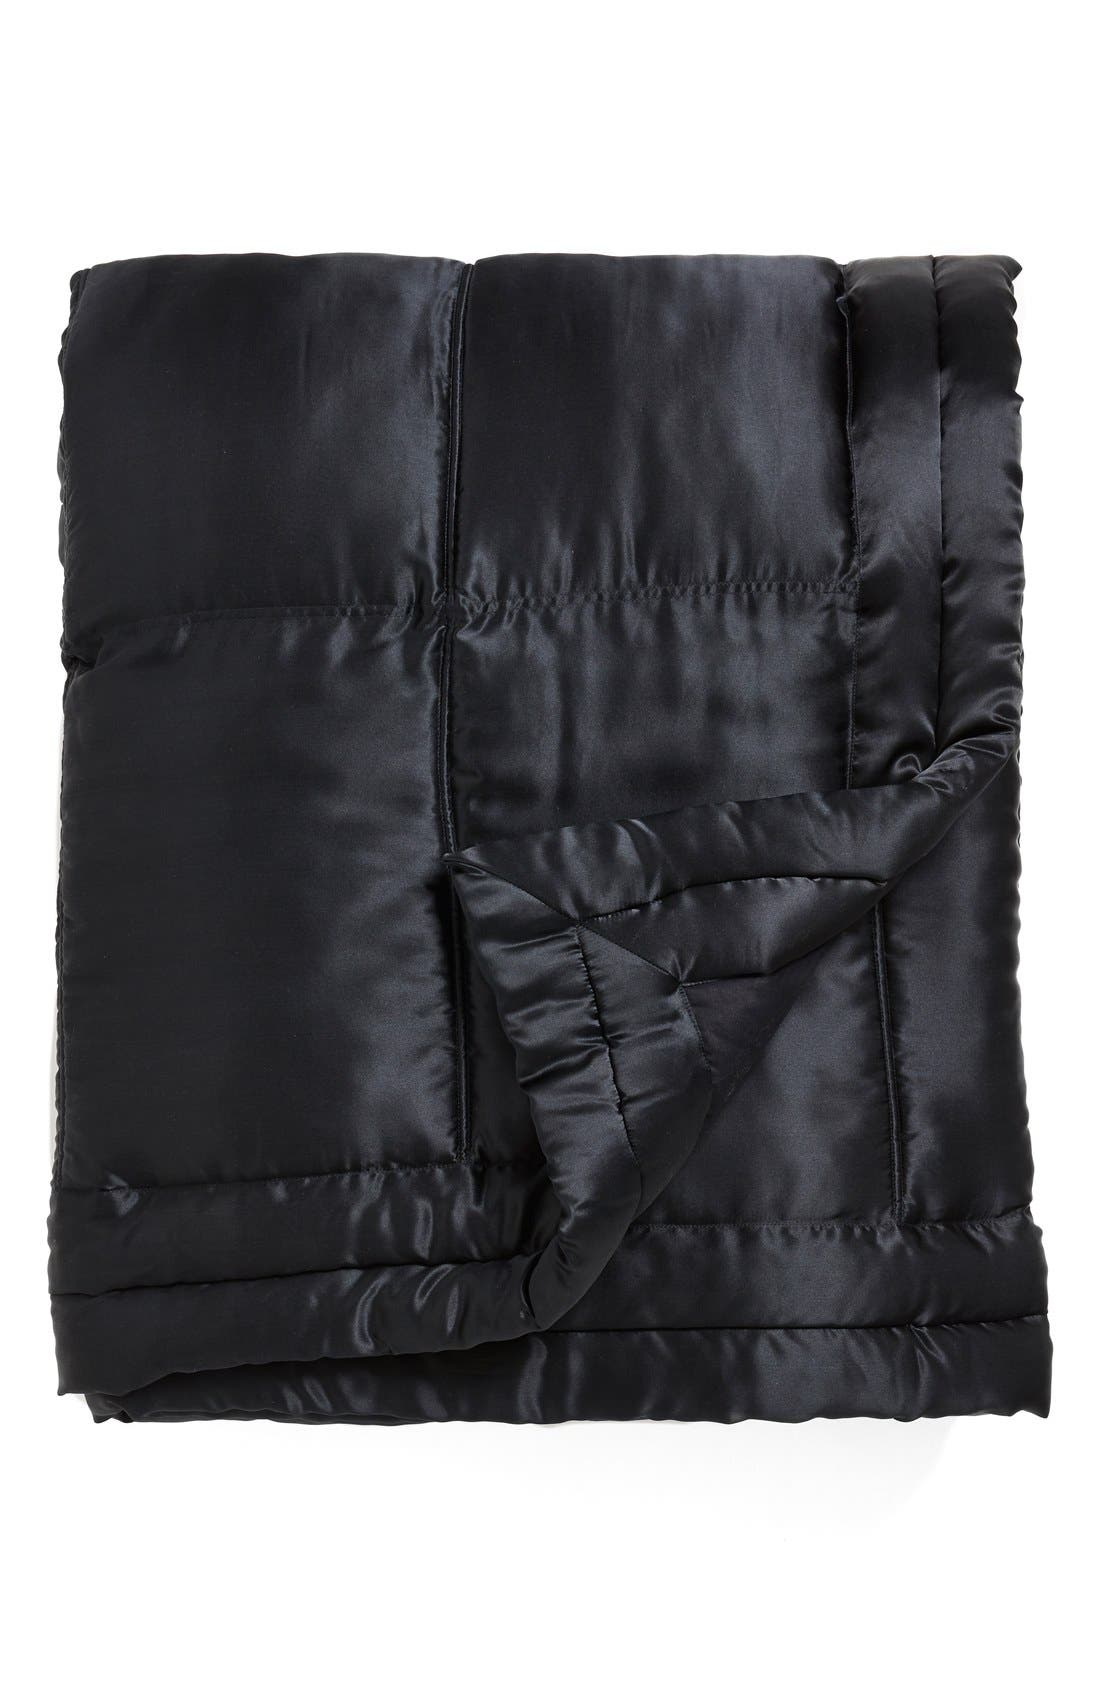 Donna Karan Collection 'Impression' Silk Charmeuse Quilt,                         Main,                         color, Ebony Black